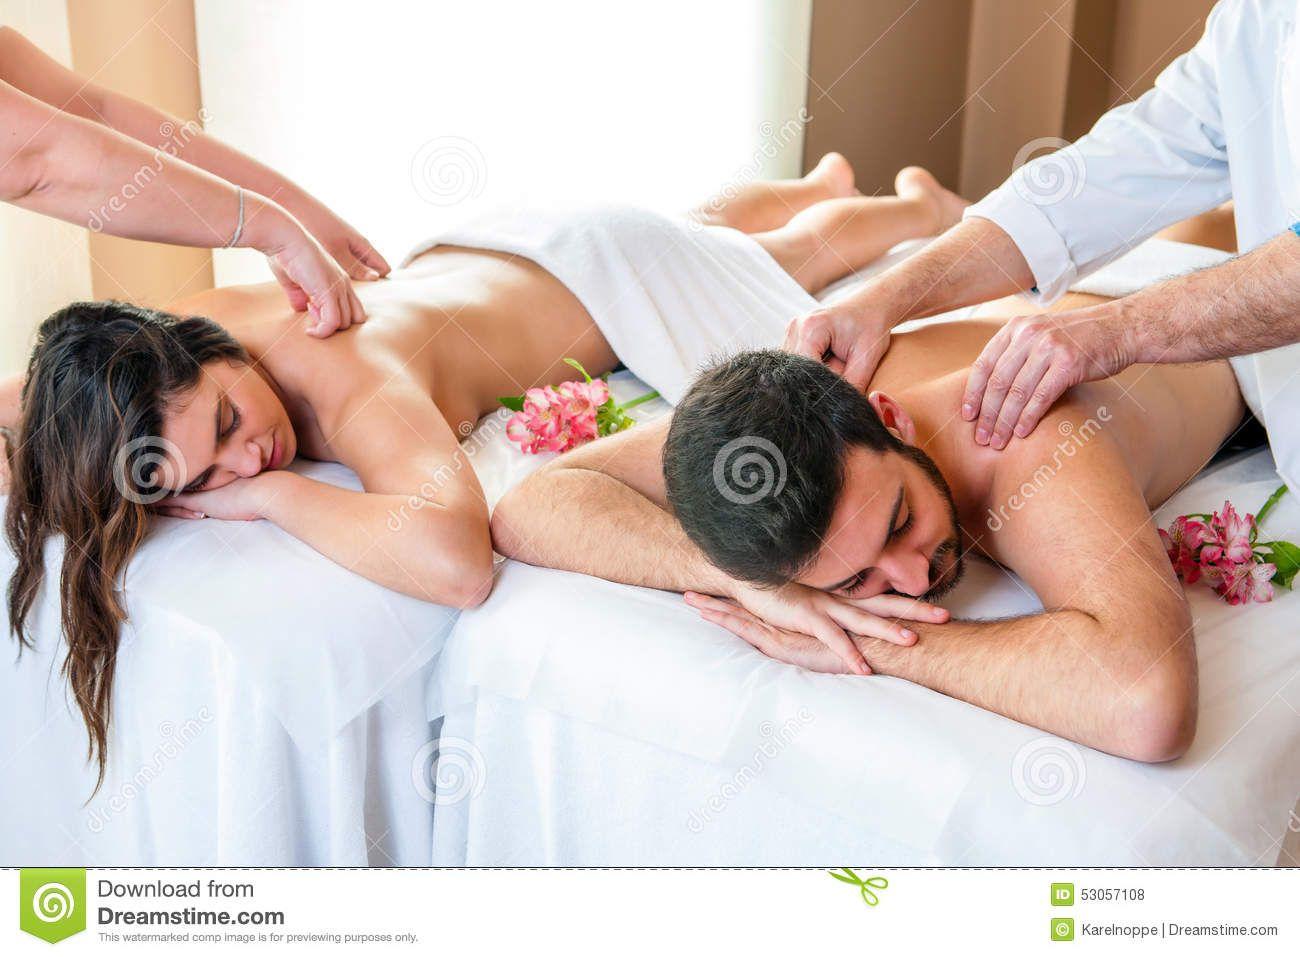 Couple Enjoying Body Massage In Spa Close Up Of Young Couple Enjoying Simultane Sponsored Ad Ad Body Body Massage Spa Relaxing Massage Couples Massage